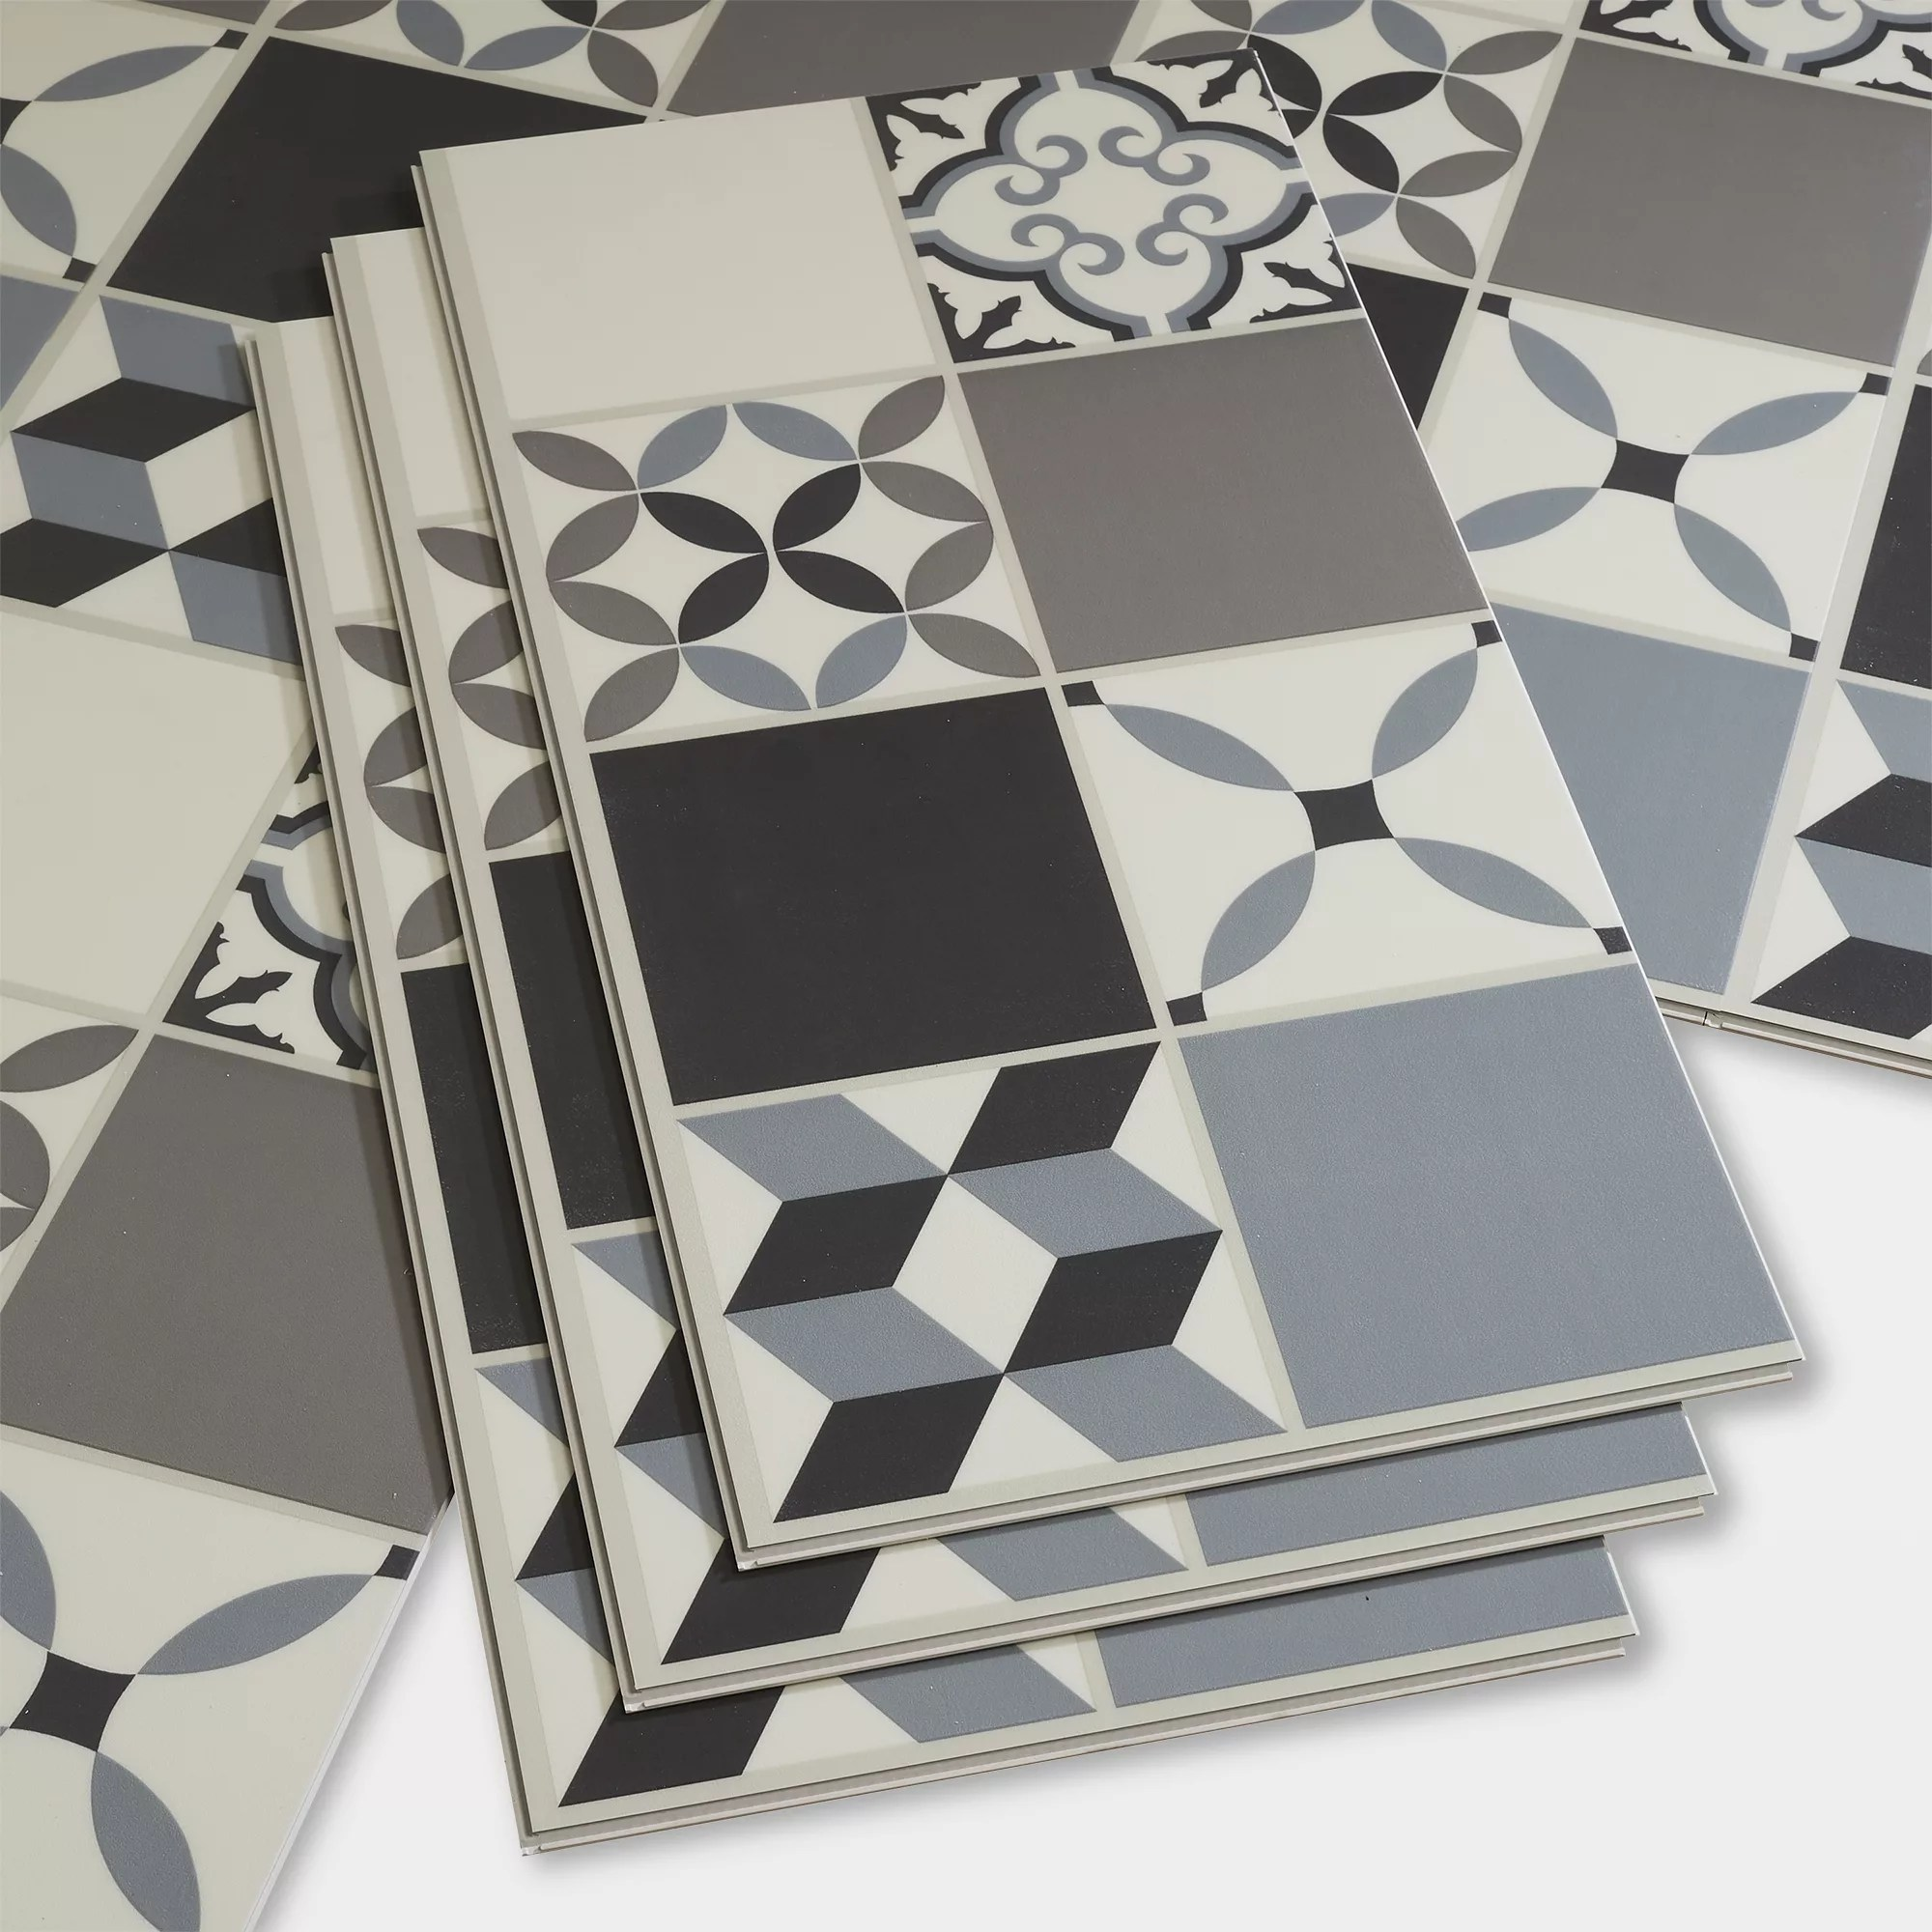 goodhome jazy grey mosaic effect luxury vinyl click flooring 2 23m pack